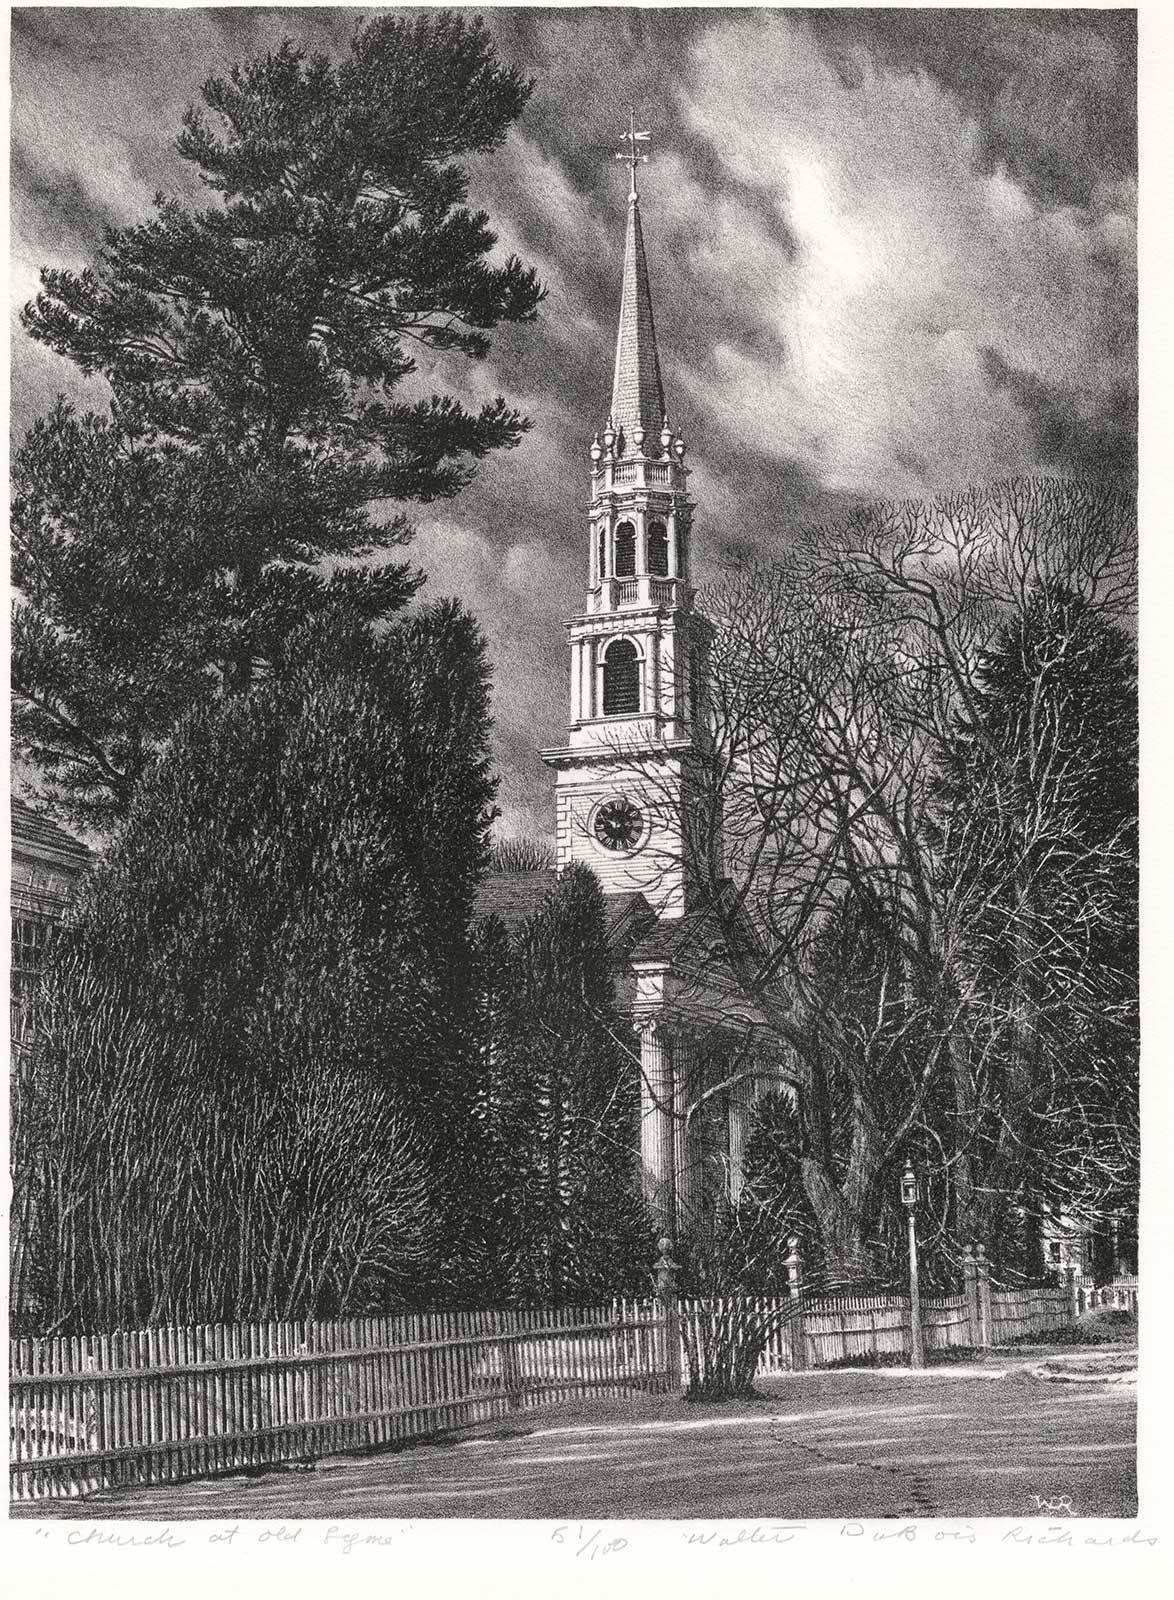 Congregational Church, Old Lyme, CT. (quintessential New England landmark)